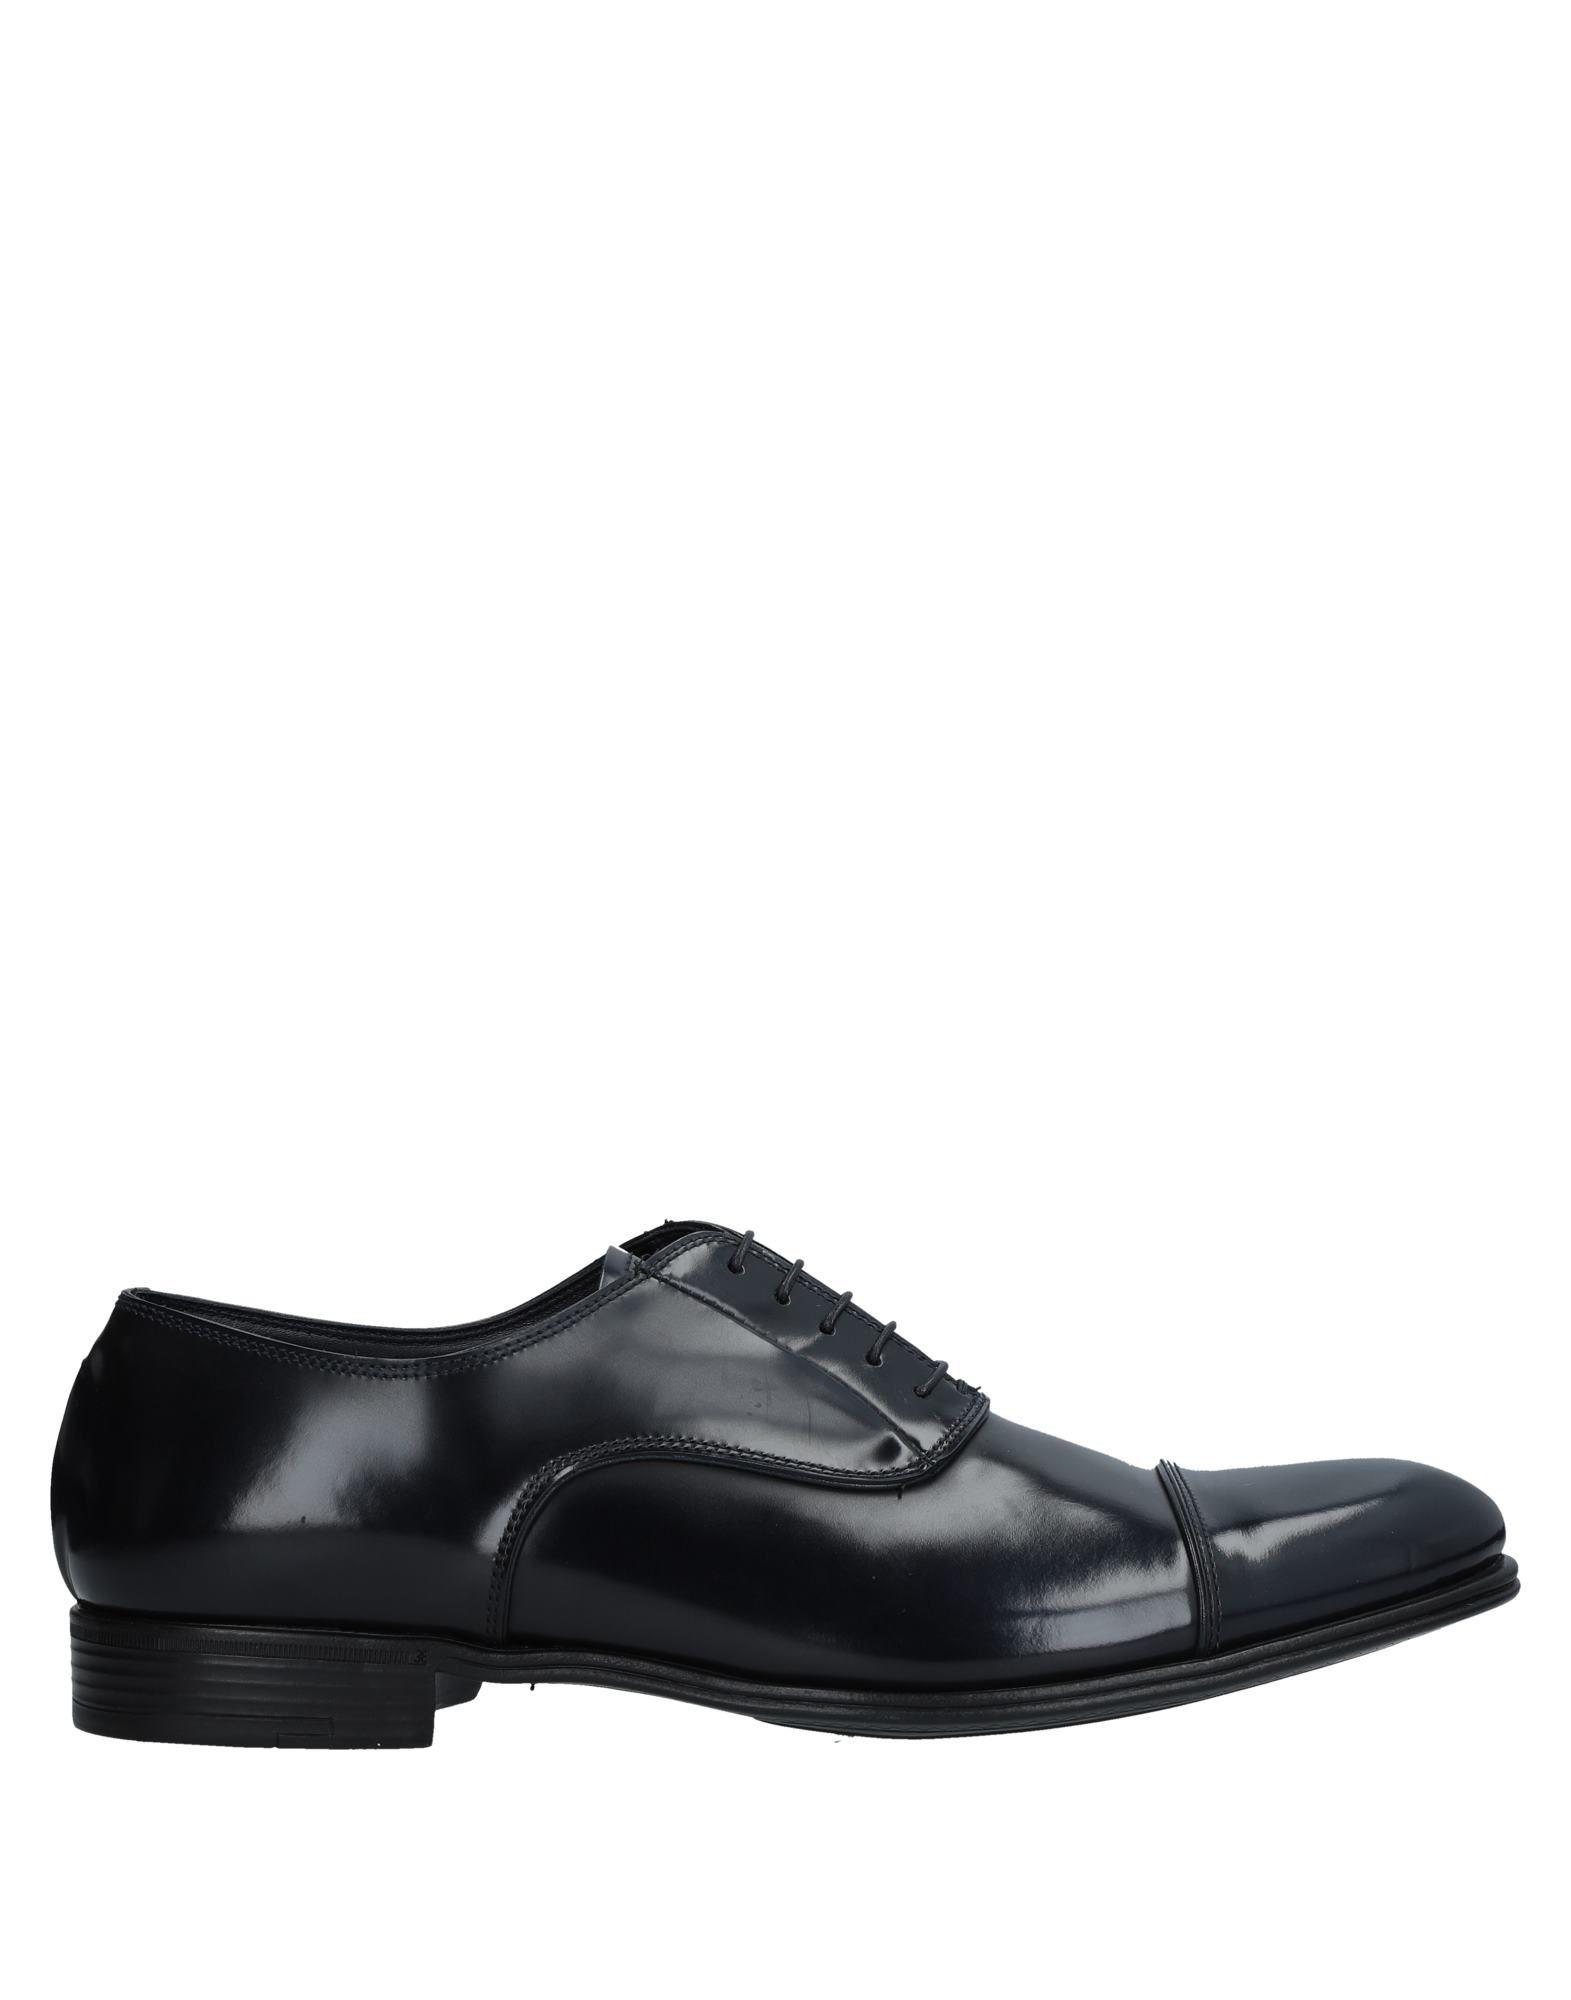 Fabi Schnürschuhe Herren  11543001LB Gute Qualität beliebte Schuhe